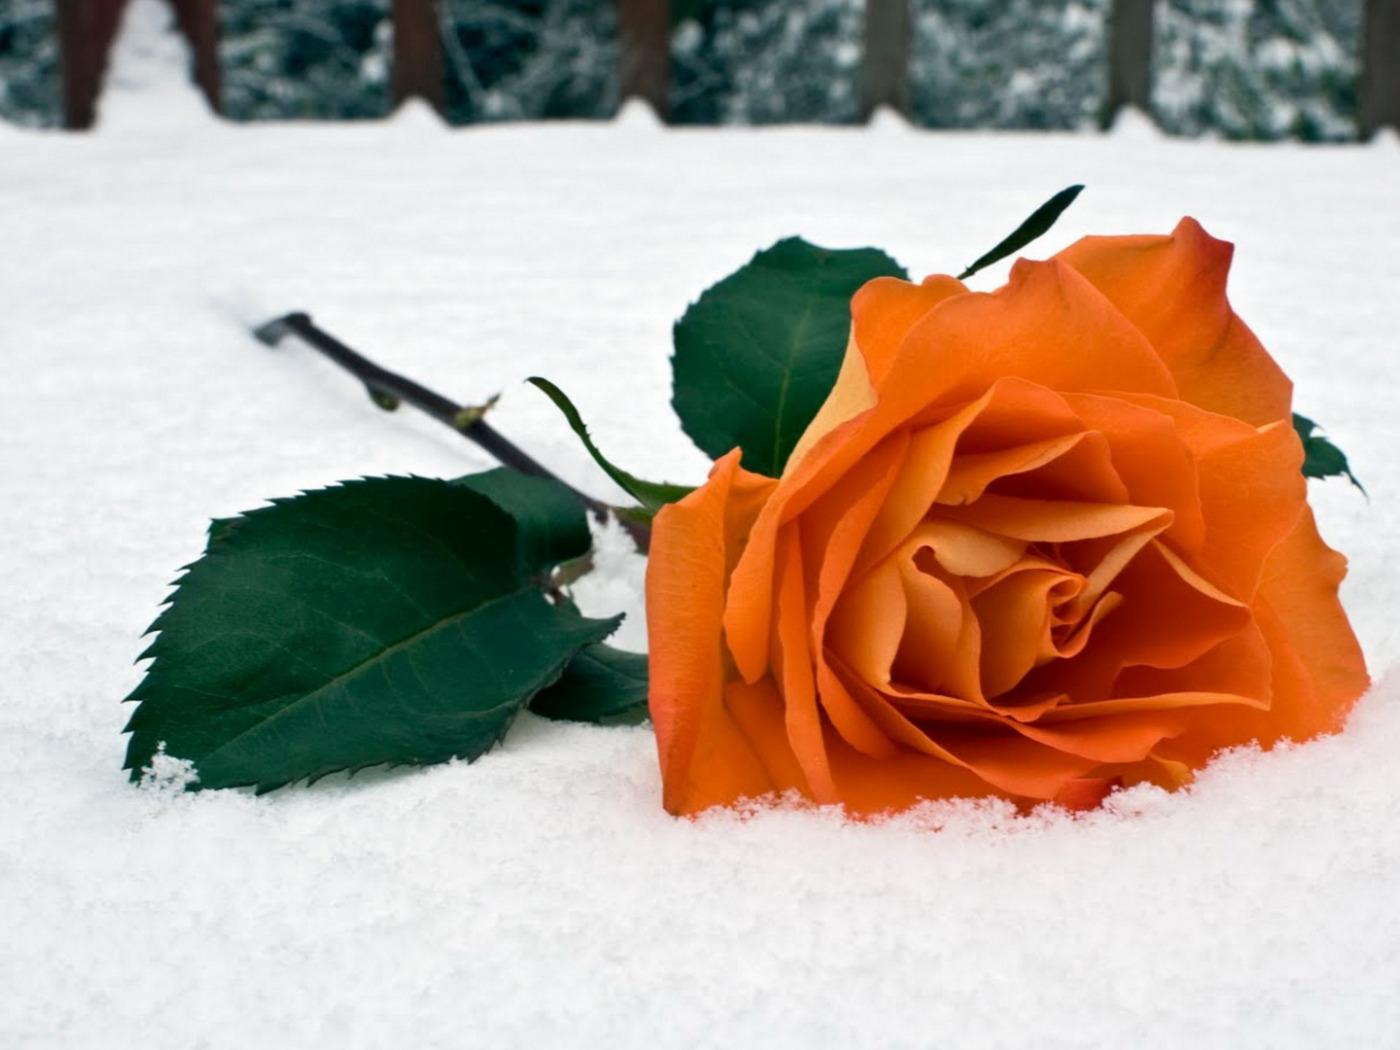 Открытки цветов зимних, спасибо господи все